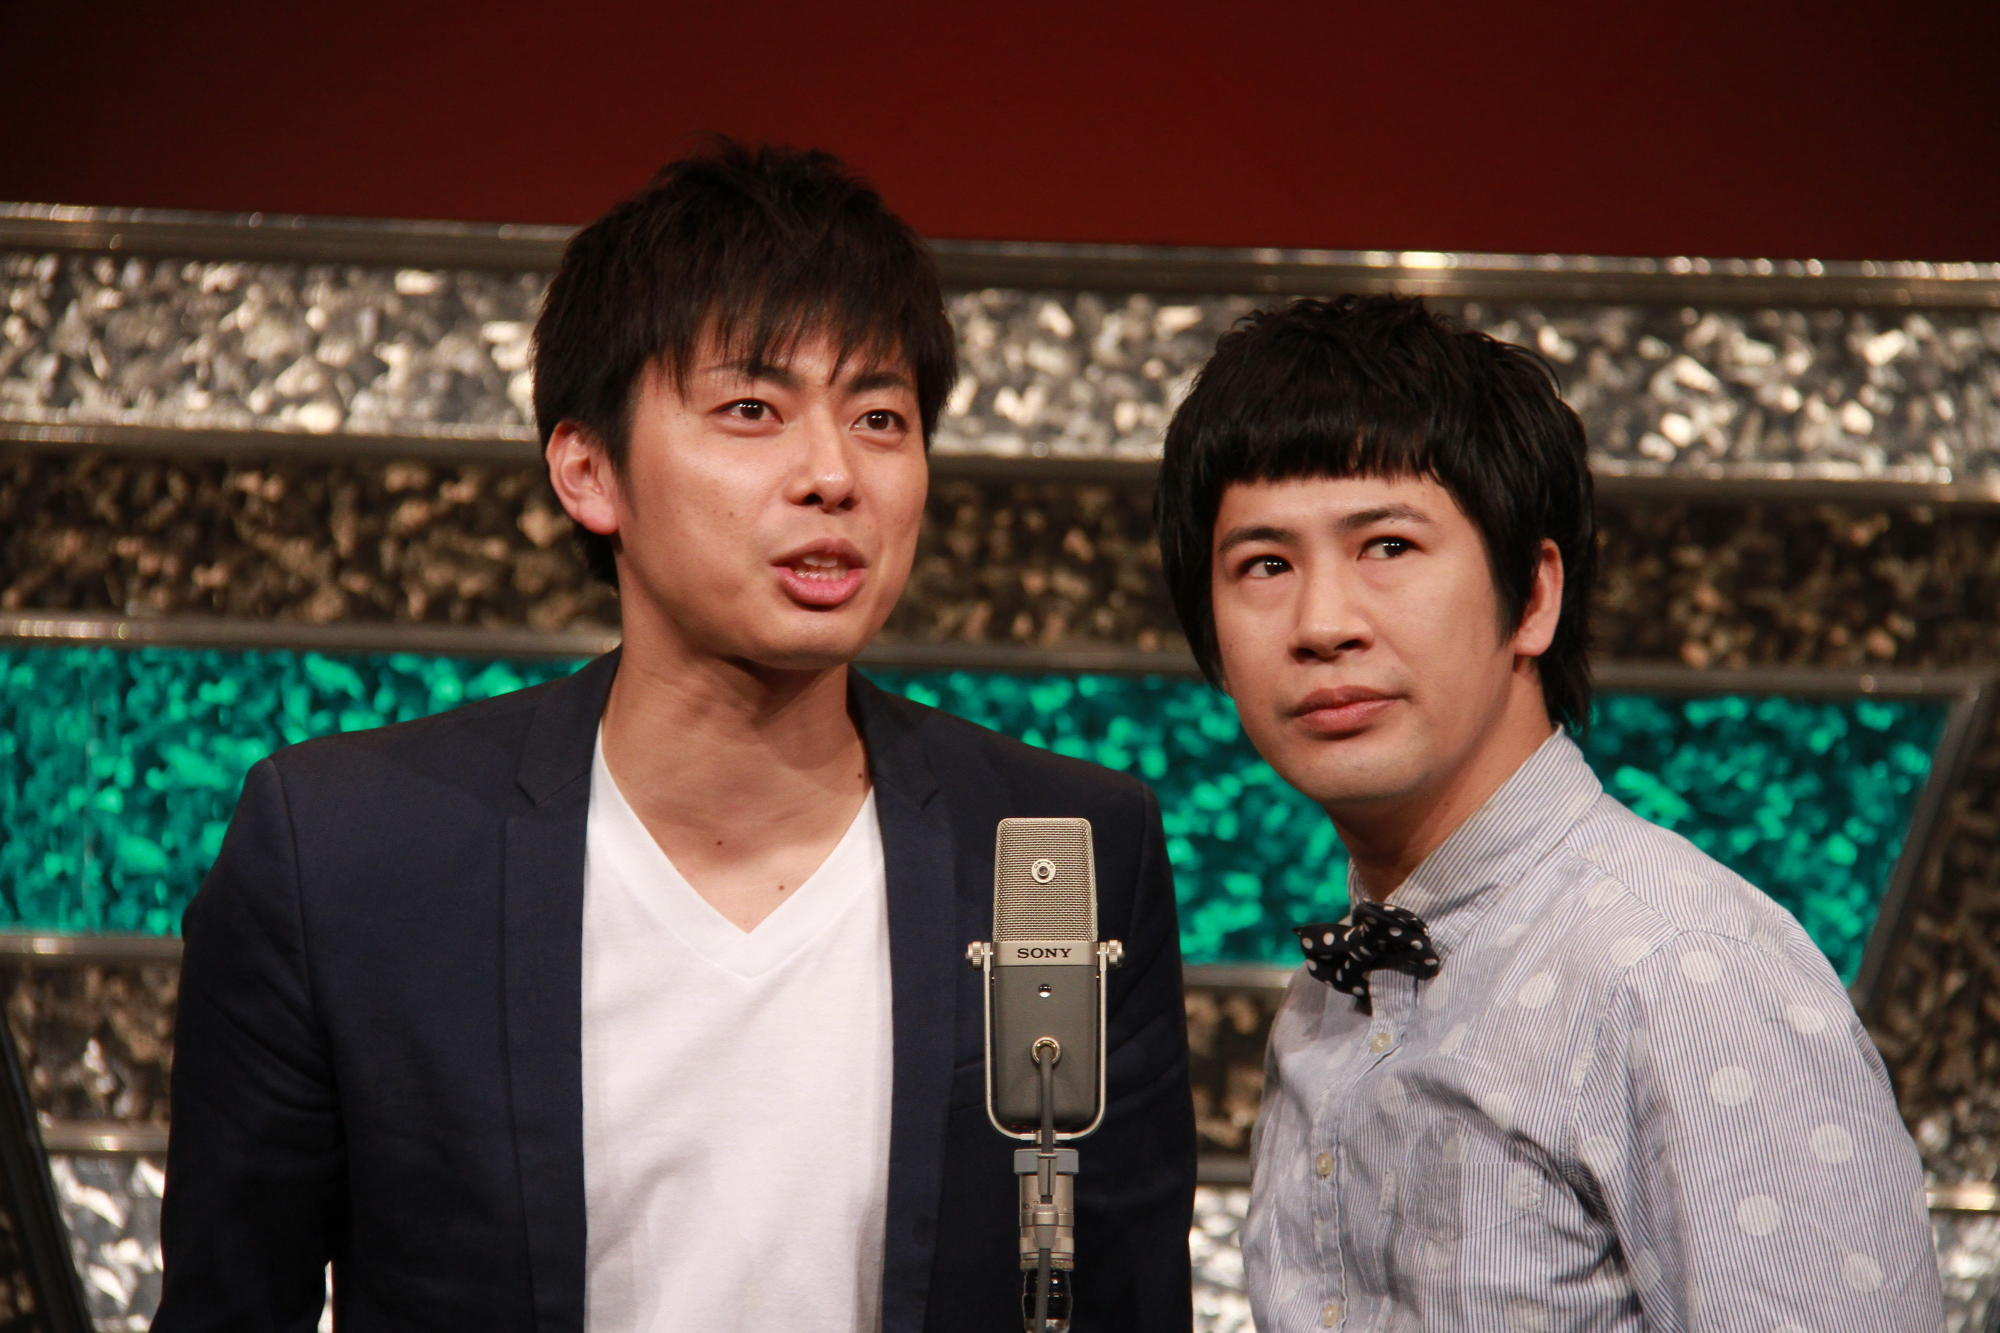 http://news.yoshimoto.co.jp/20151230120955-e920600b18e669795c08c2c7c4bfd2e8aaa03c4a.jpg